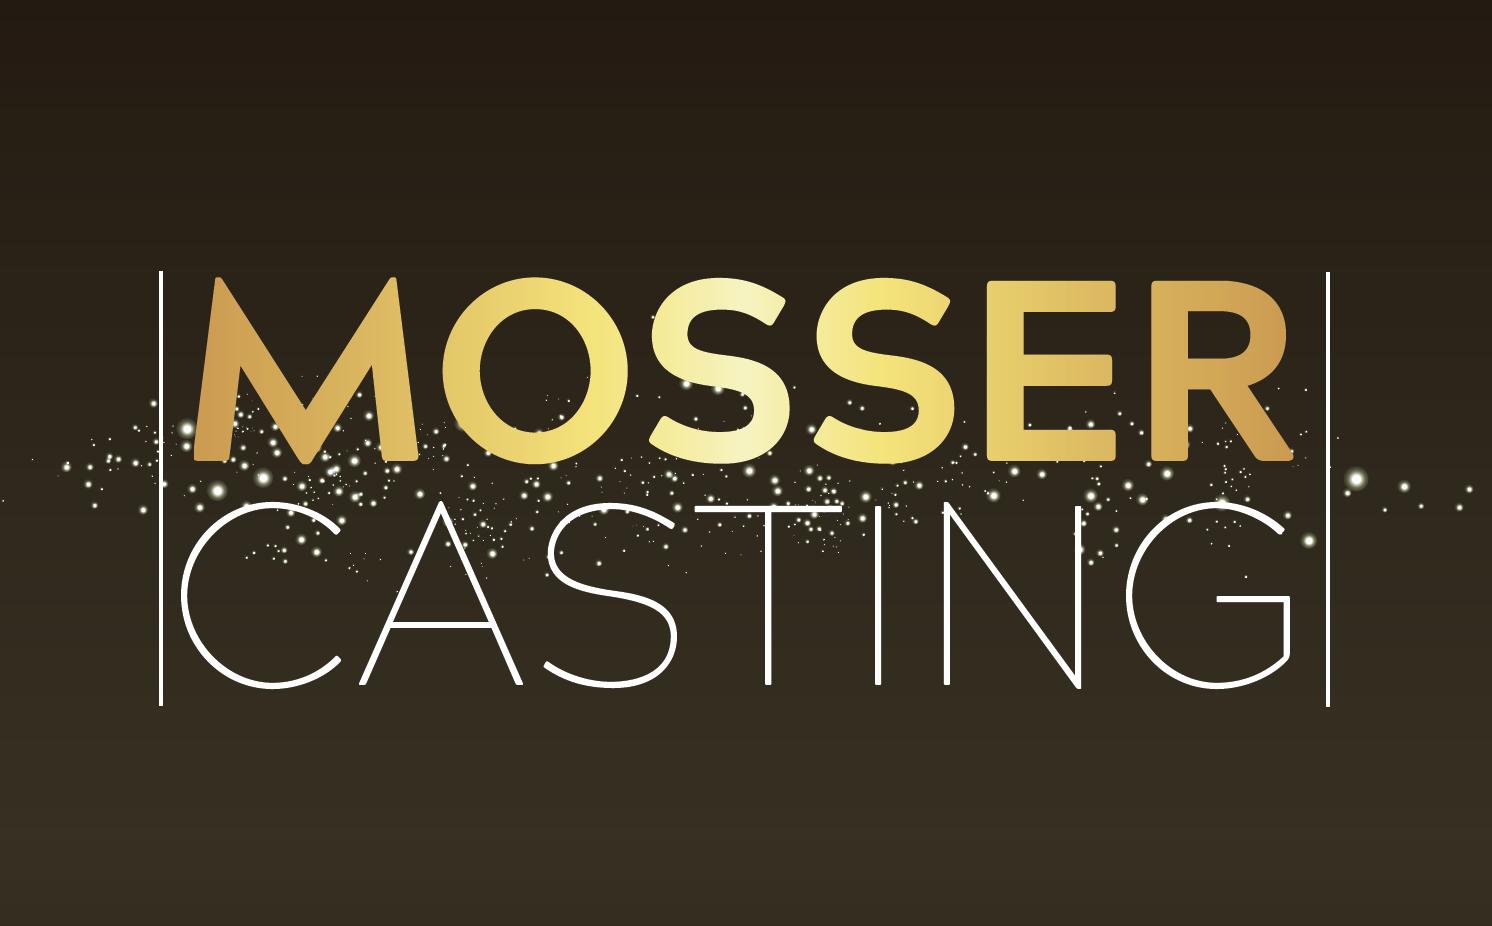 Nancy Mosser Casting